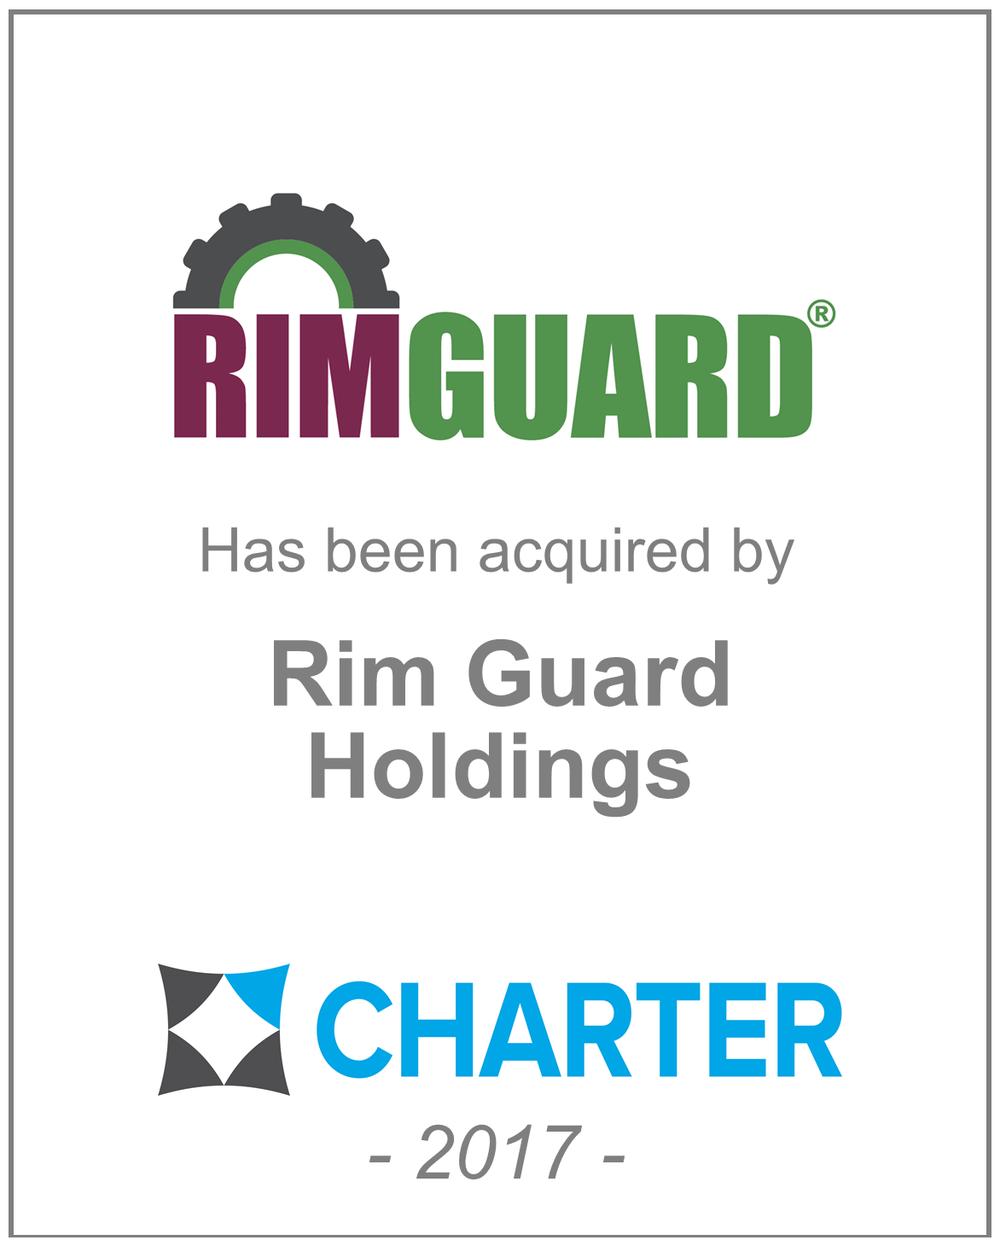 rimguard.png